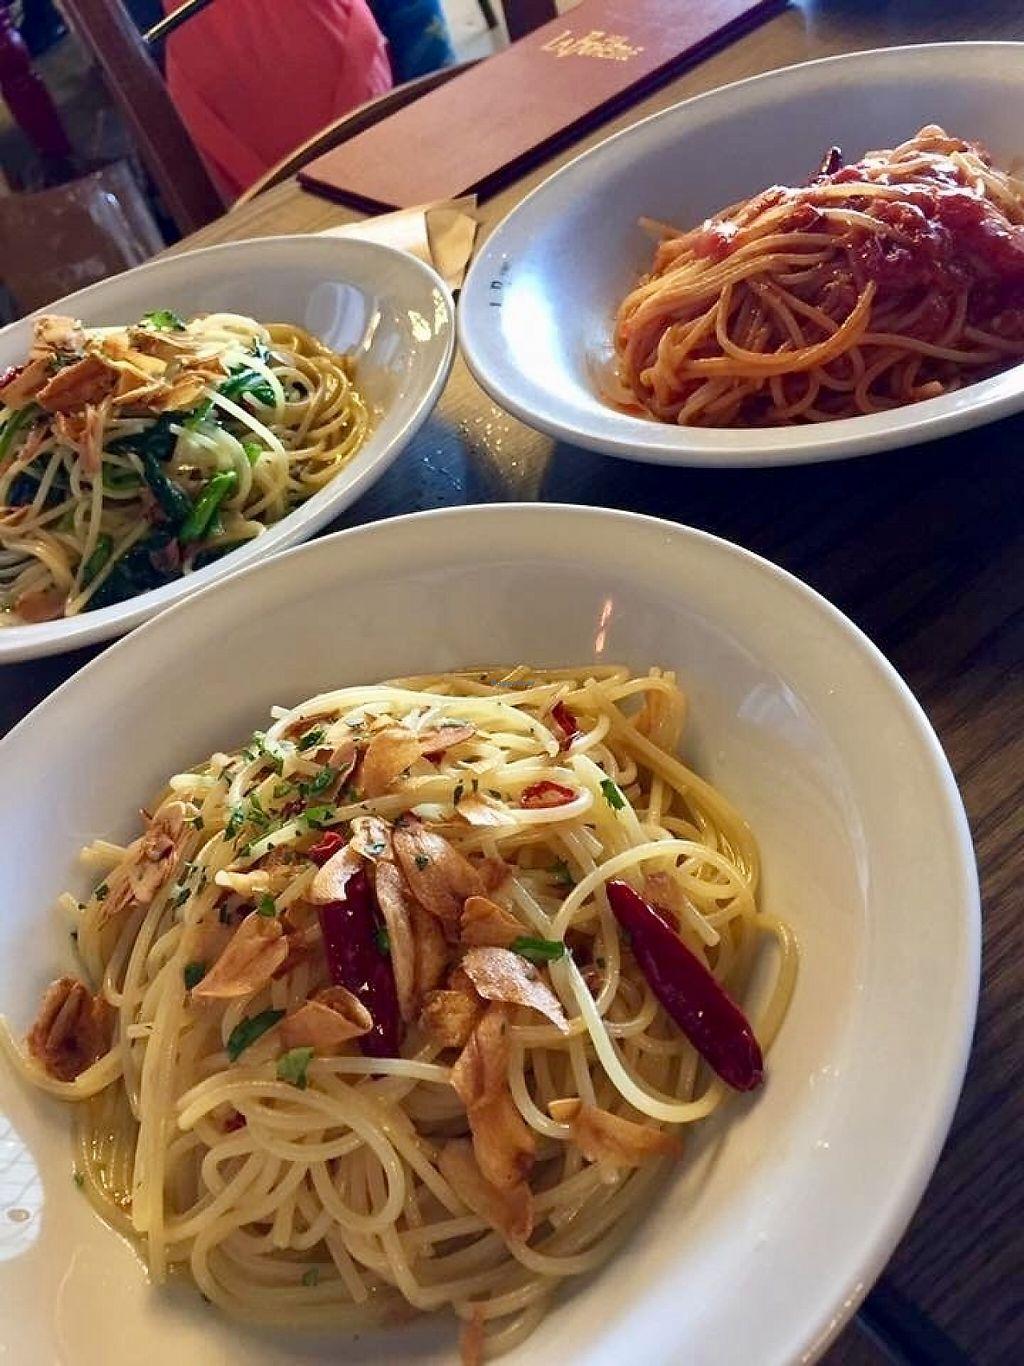 "Photo of Cafe La Boheme - Shirokane  by <a href=""/members/profile/paulkates"">paulkates</a> <br/>Vegan pasta <br/> June 7, 2017  - <a href='/contact/abuse/image/93489/266545'>Report</a>"